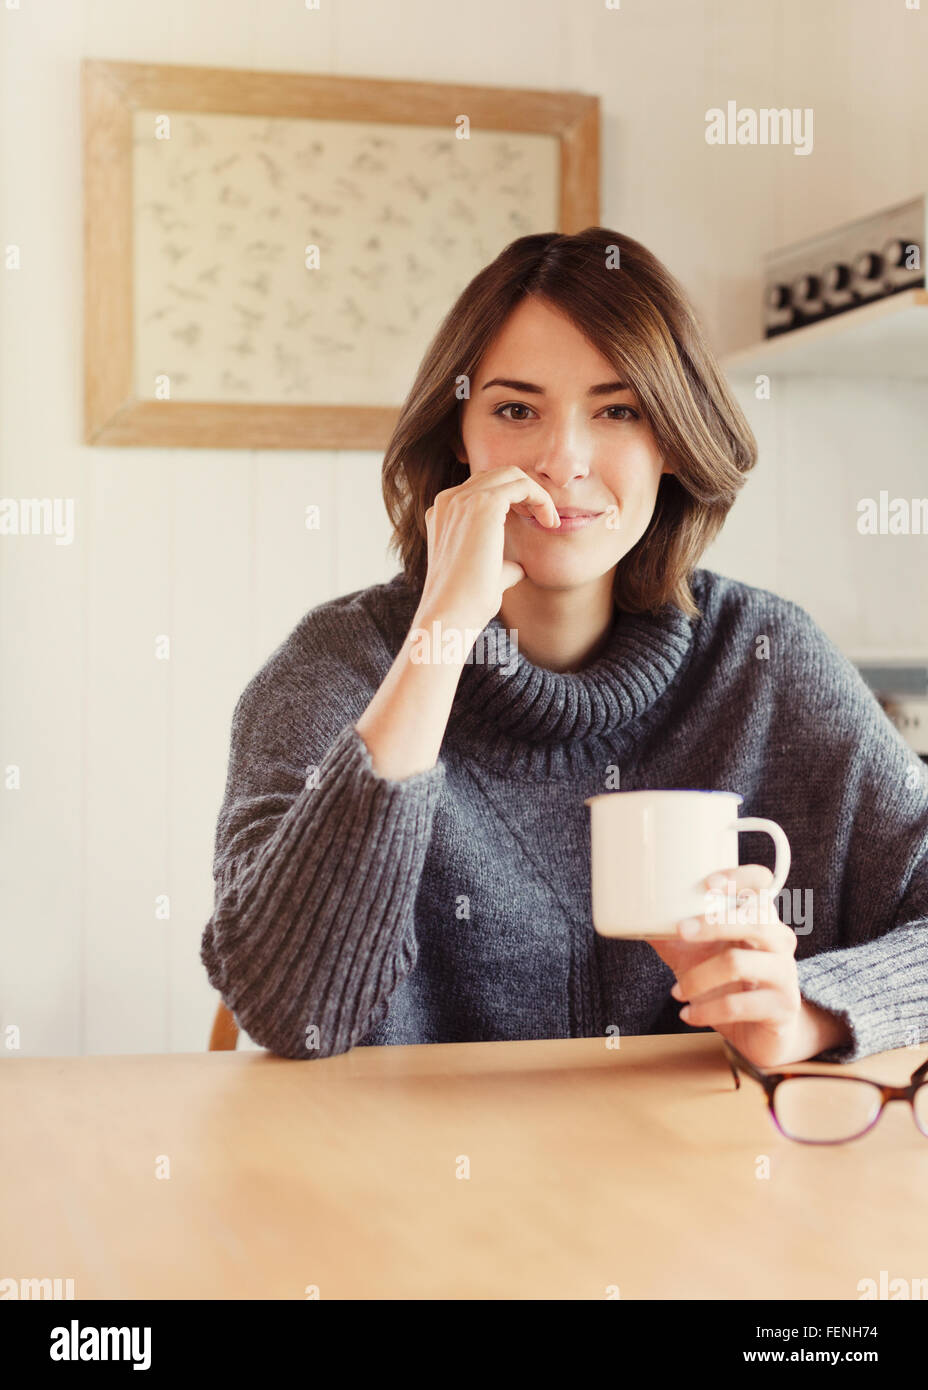 Porträt selbstbewusste Brünette Frau trinken Kaffee am Tisch Stockbild